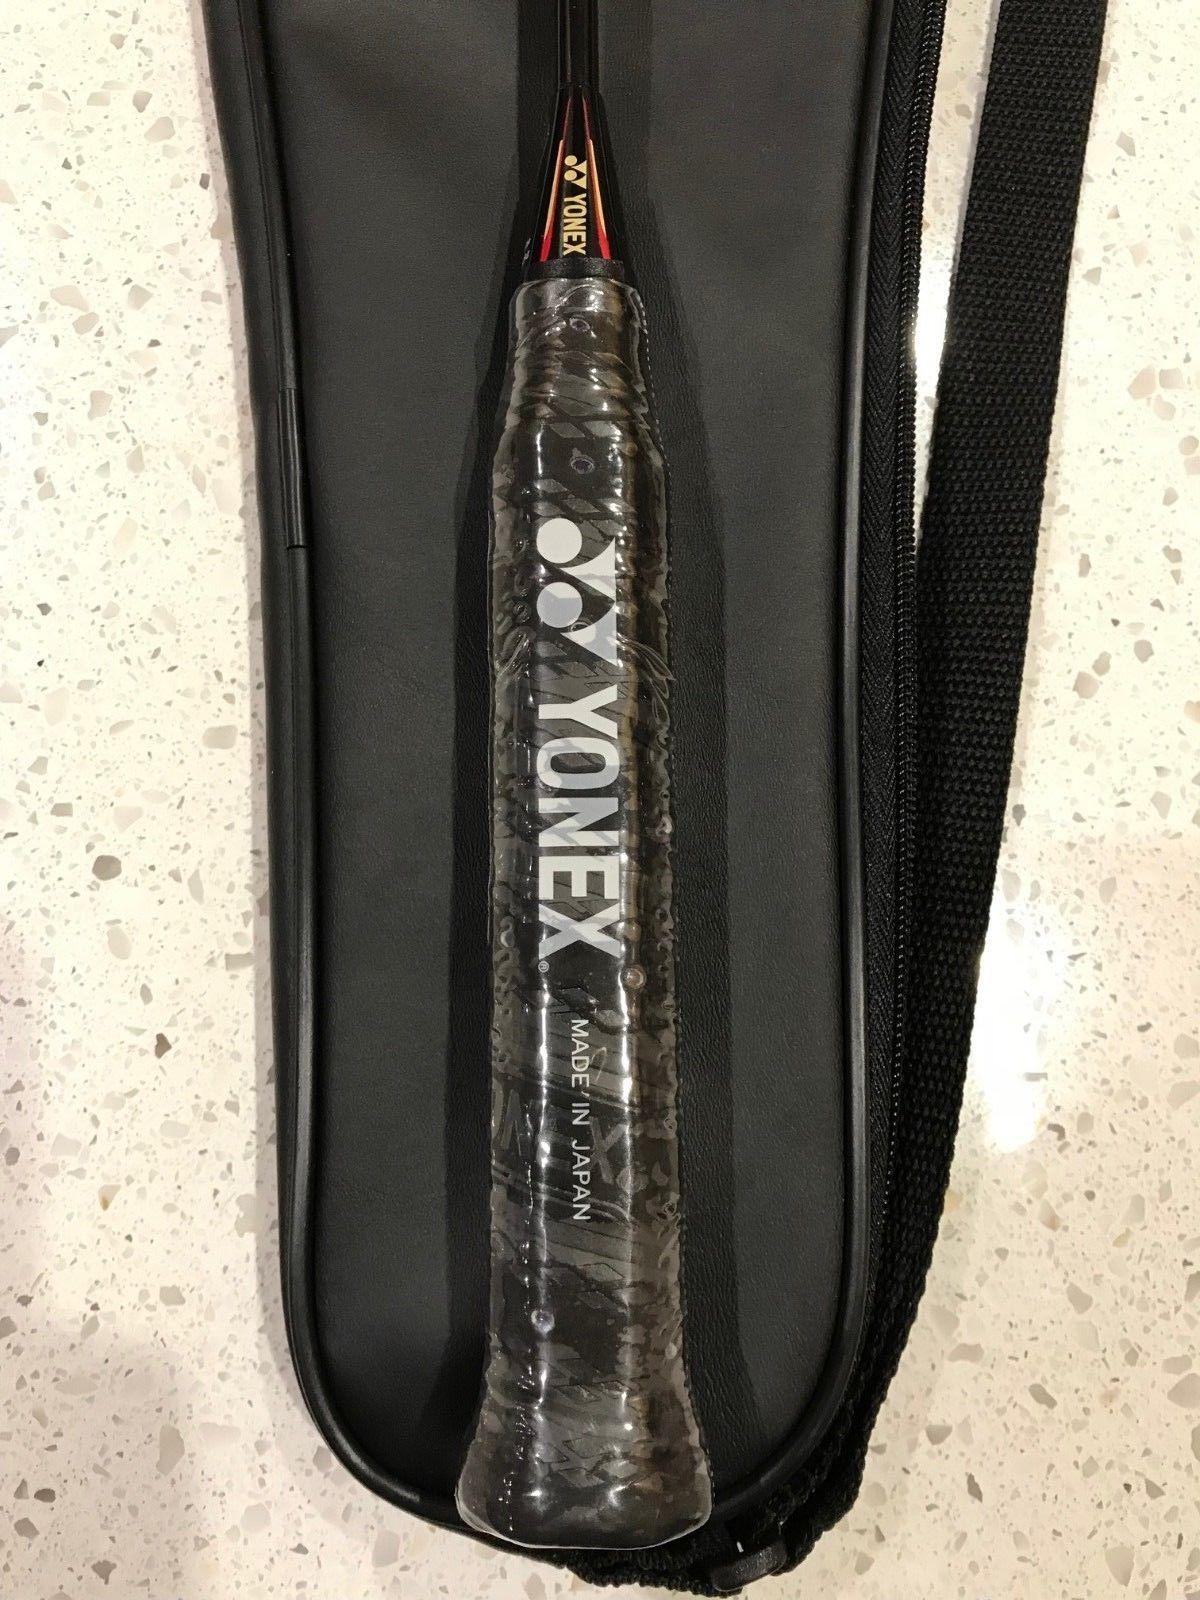 YONEX NANOSPEED 9900 3UG5 - Badminton Store